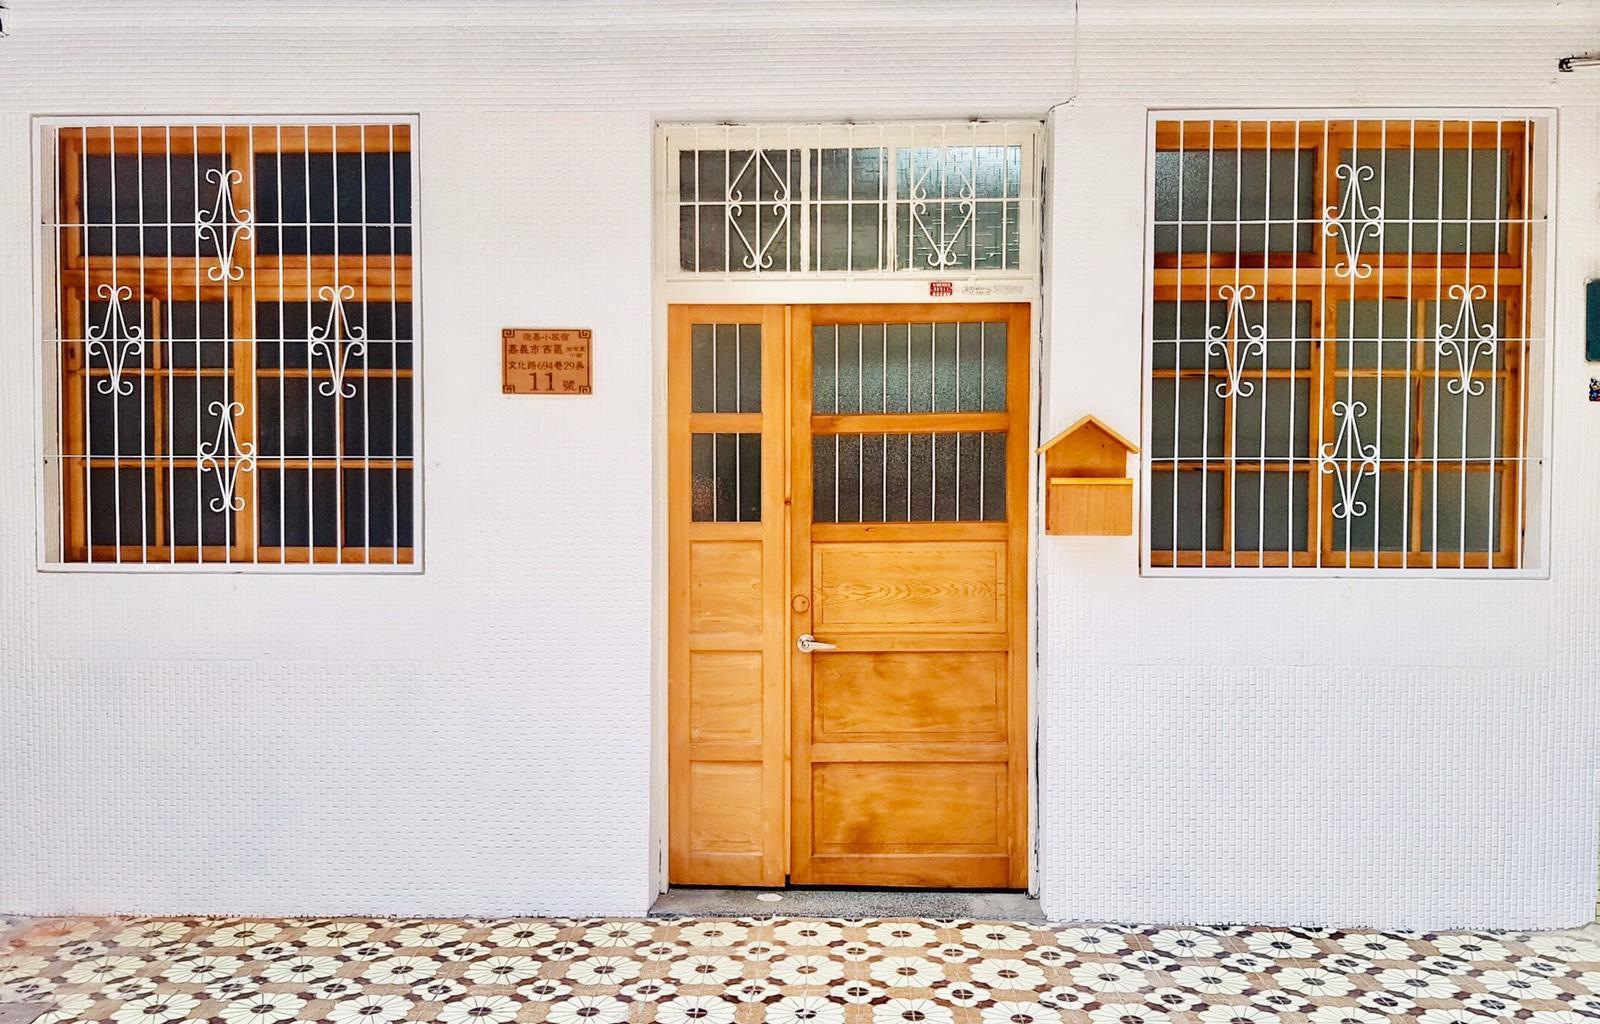 Hui Jia Hostel